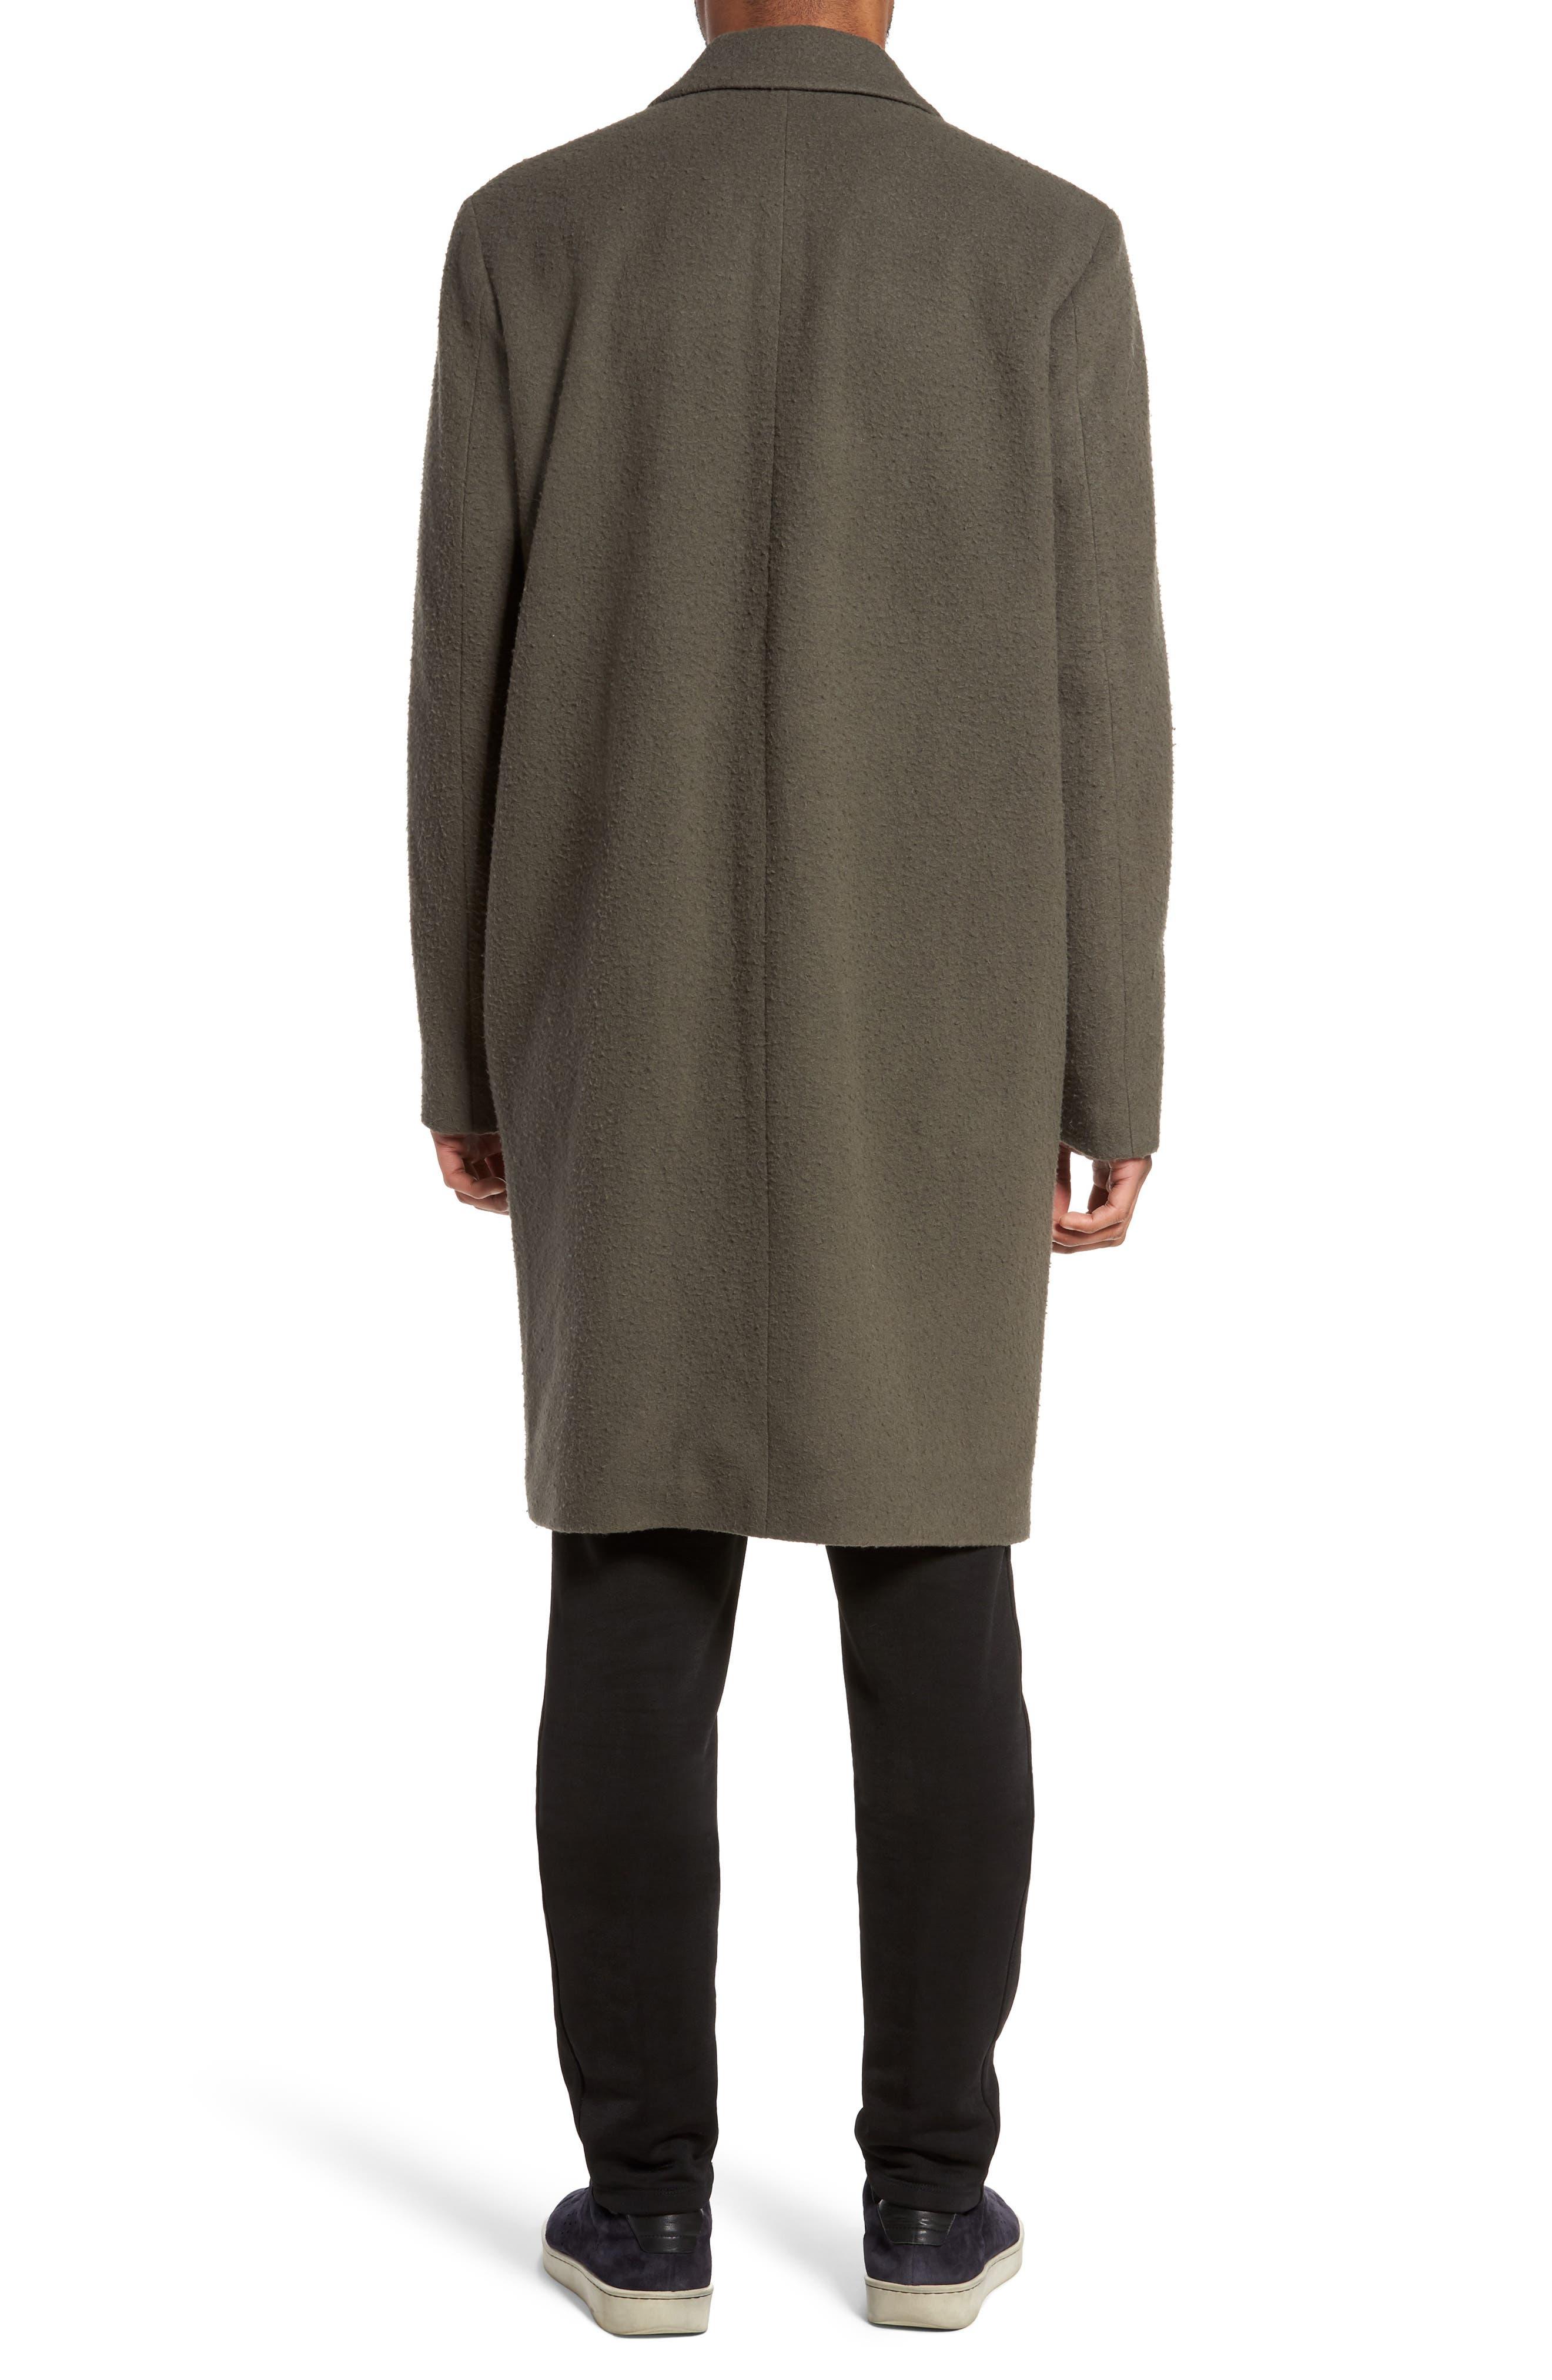 Distressed Wool Blend Car Coat,                             Alternate thumbnail 2, color,                             310